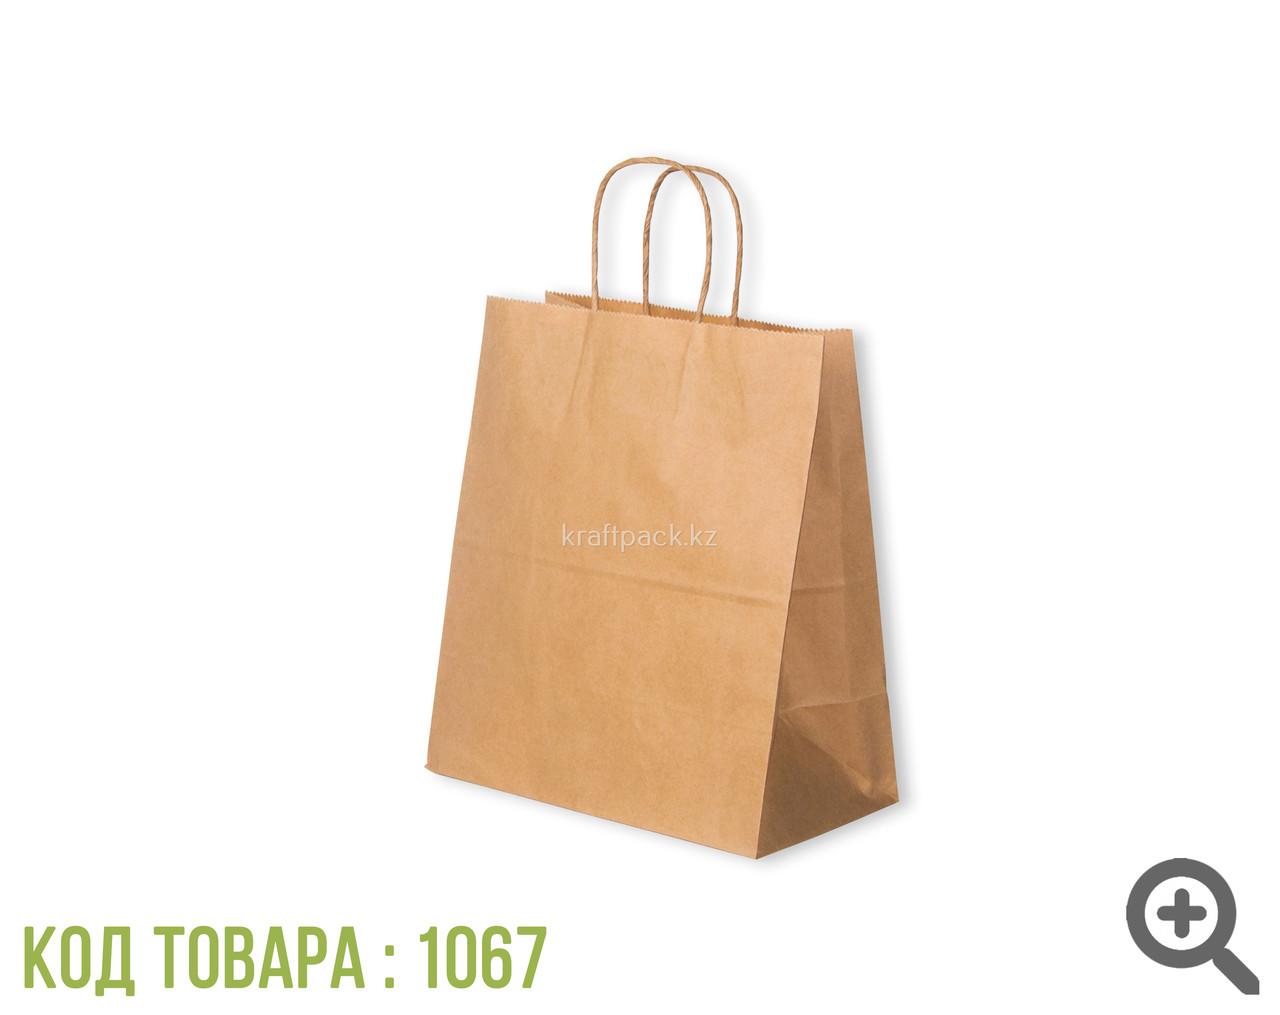 Бумажный пакет из крафт бумаги, бурый с ручкой 70гр 240*140*280 (300 шт/уп)